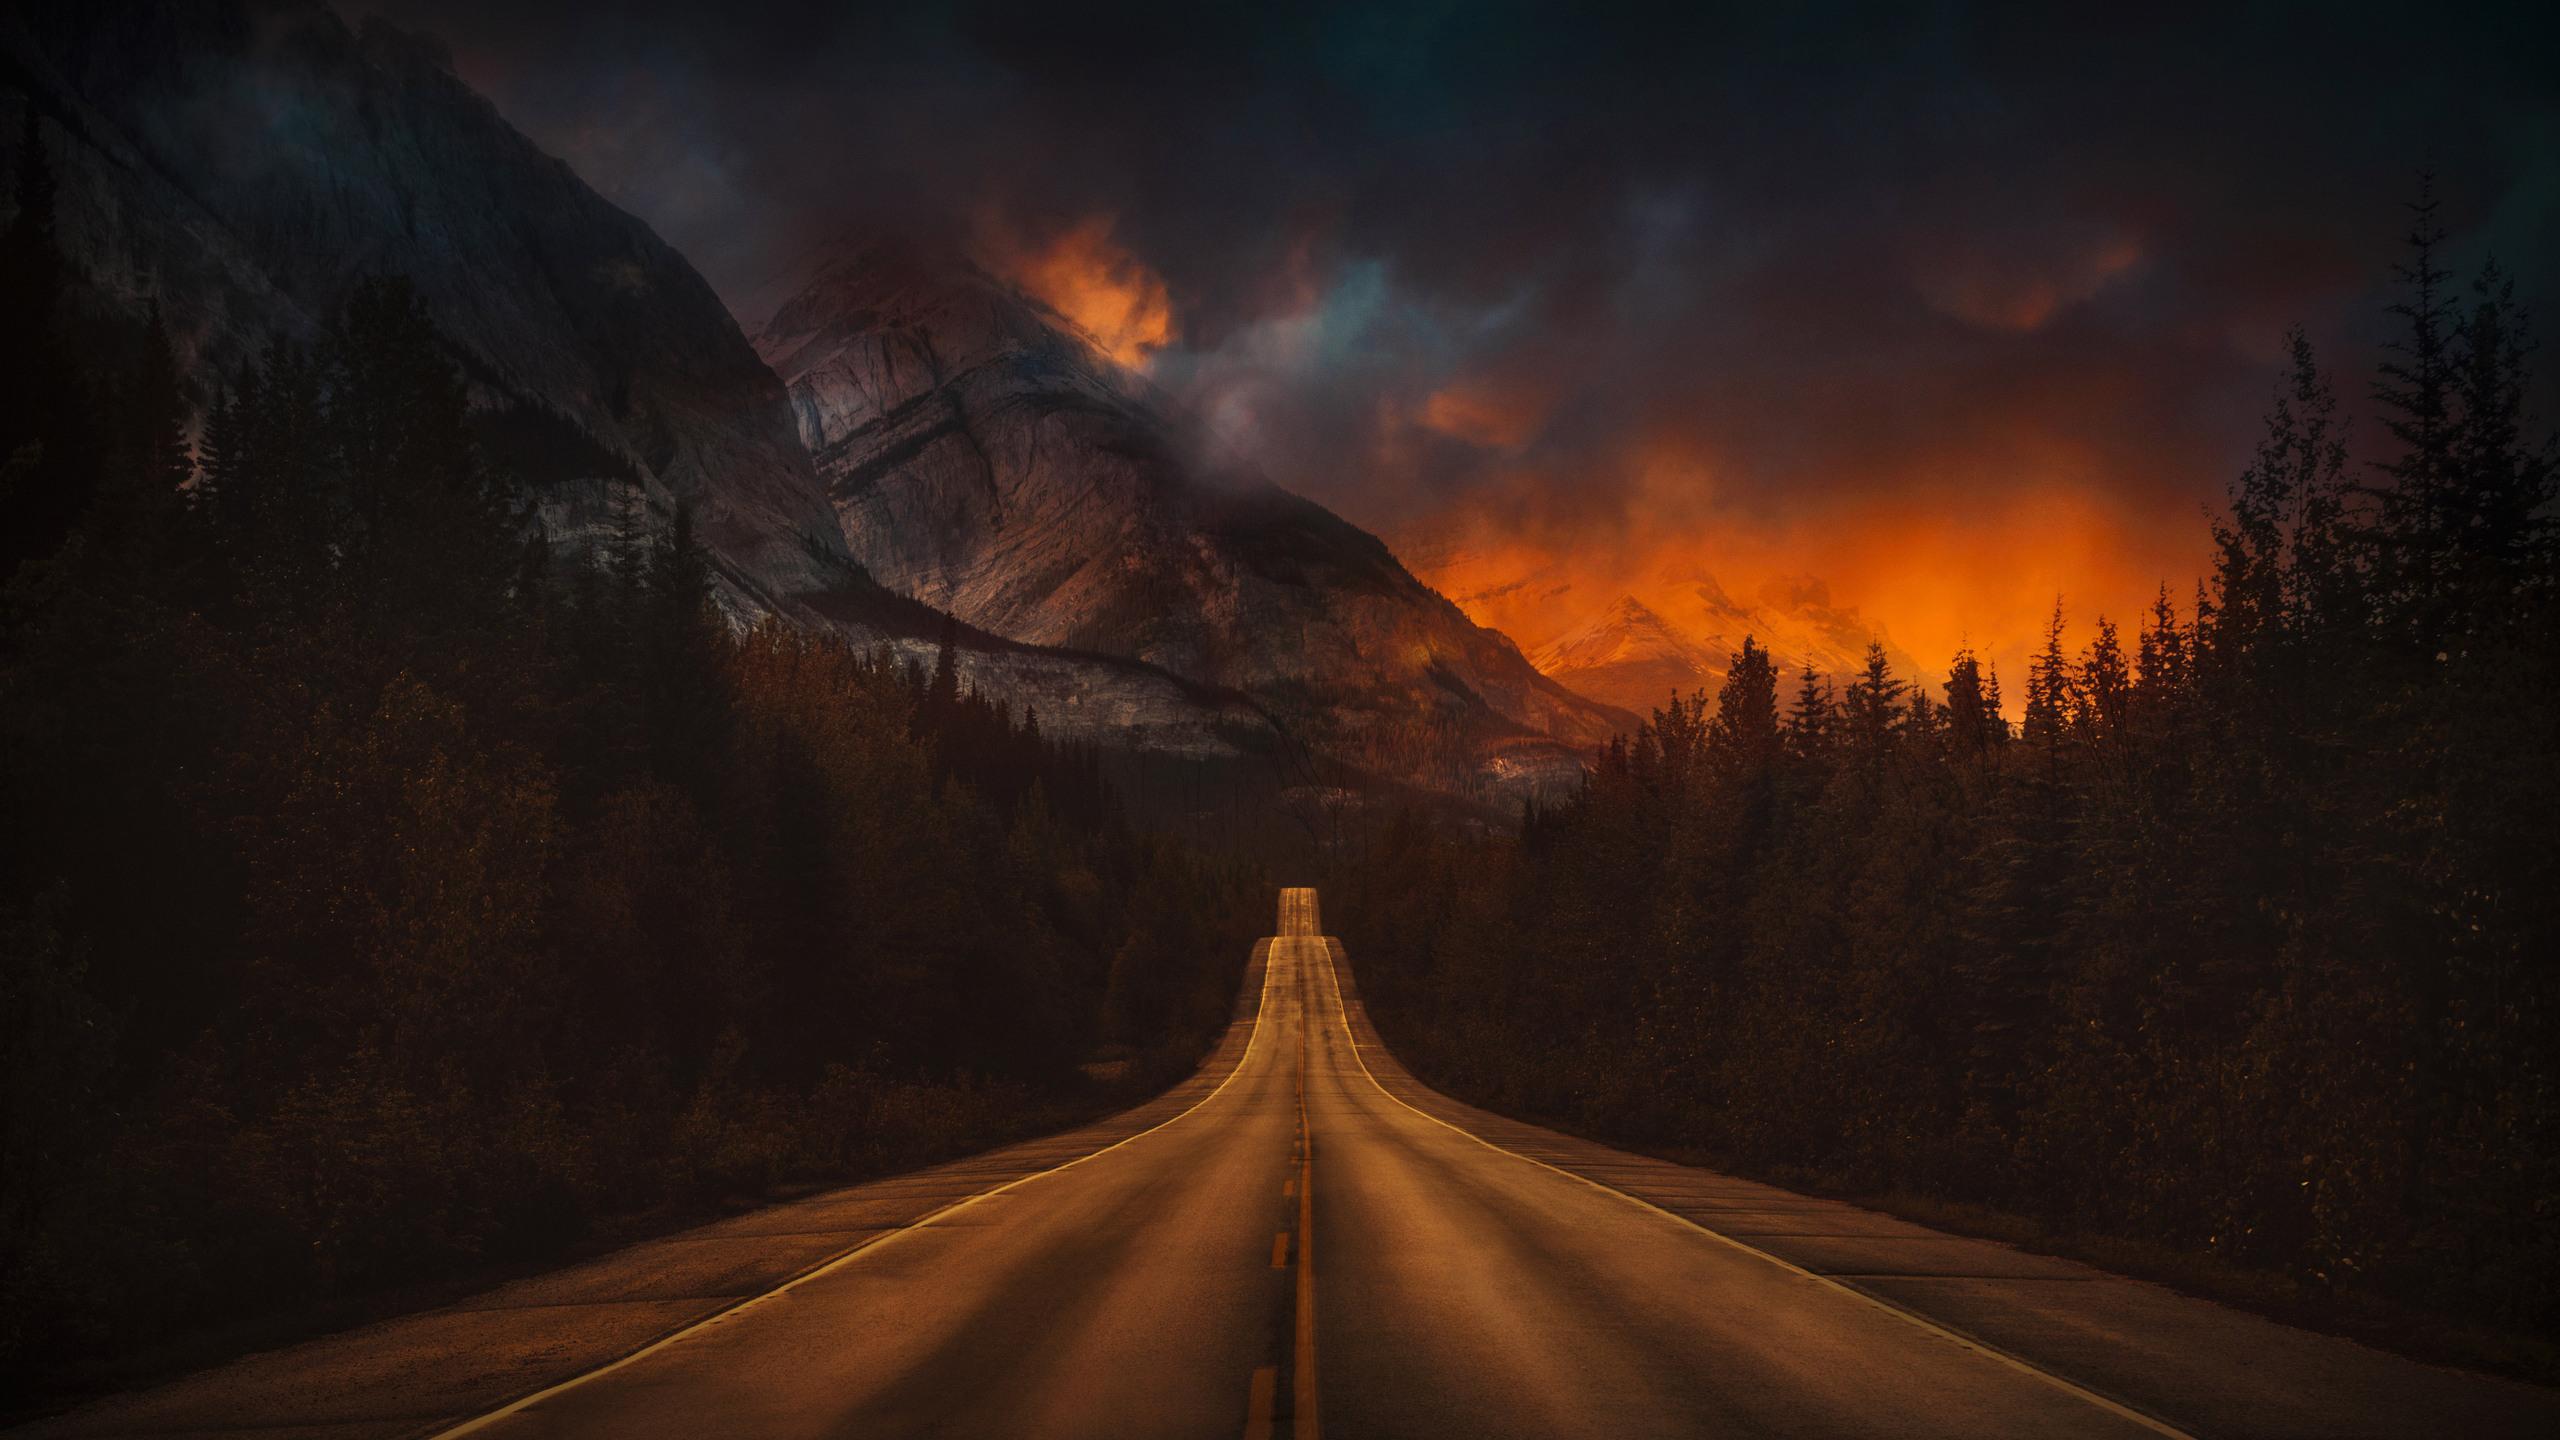 2560x1440 mountain nature night road 4k 1440p resolution - Night mountain wallpaper 4k ...